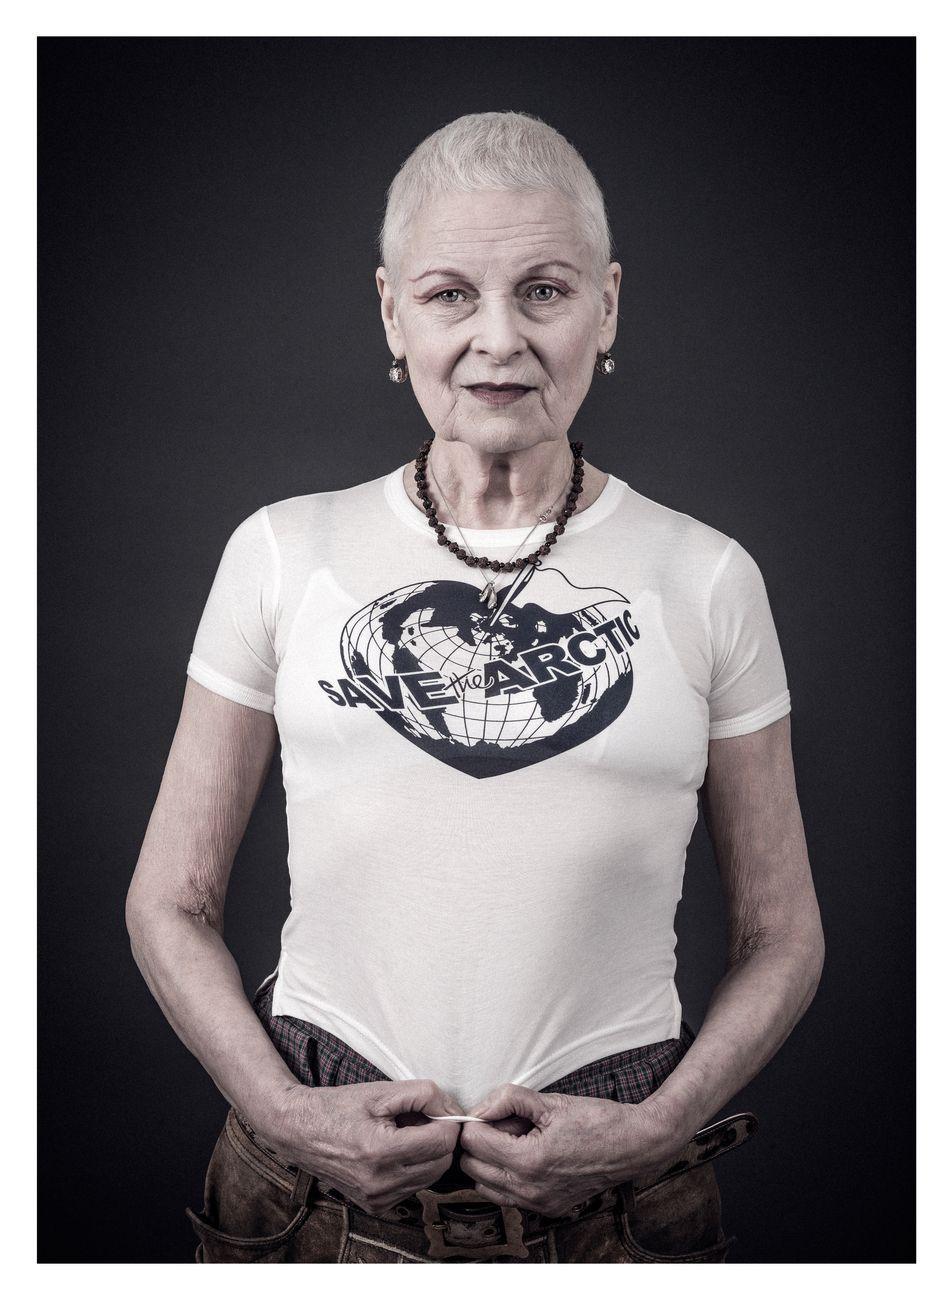 Save the Arctic T-shirt. Courtesy Vivienne Westwood Archive